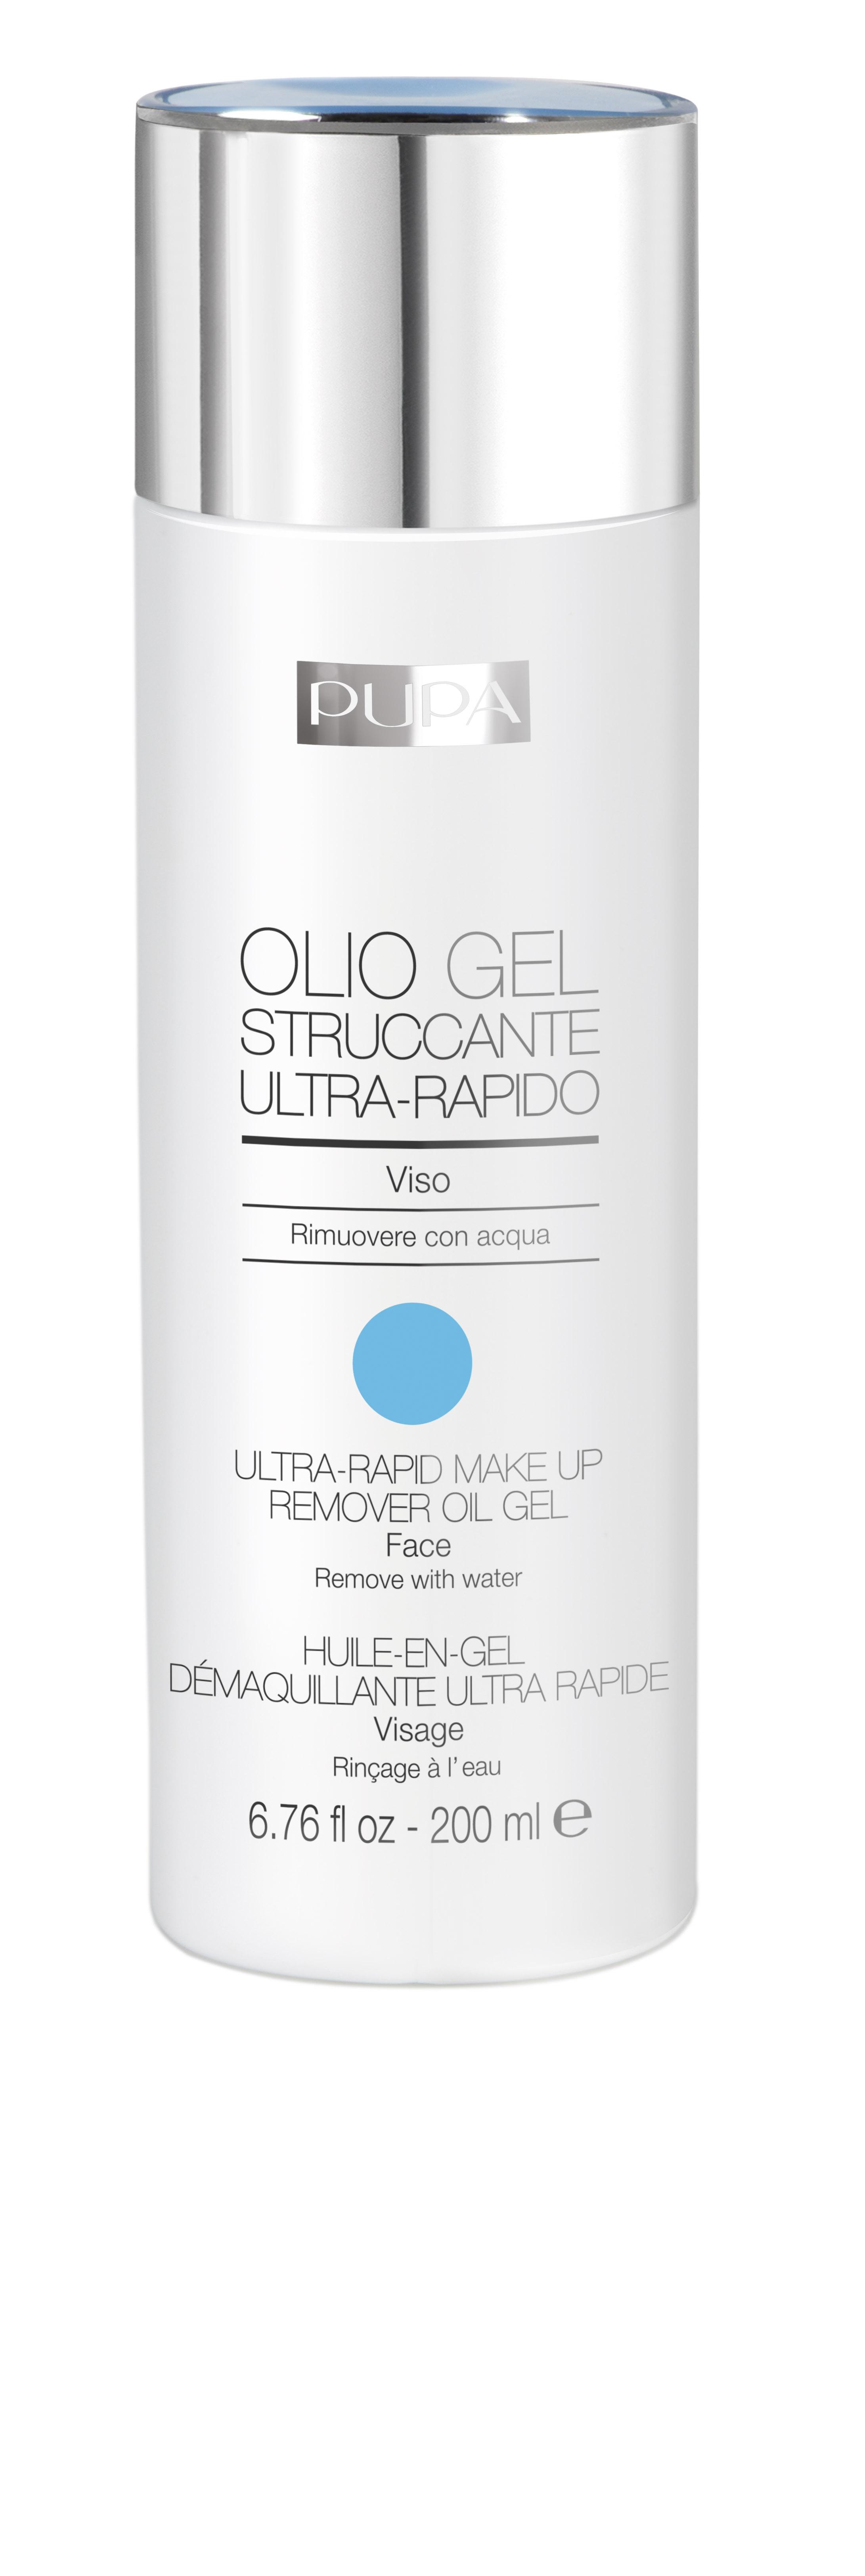 olio_gel_struccante_ultra_rapido.jpg